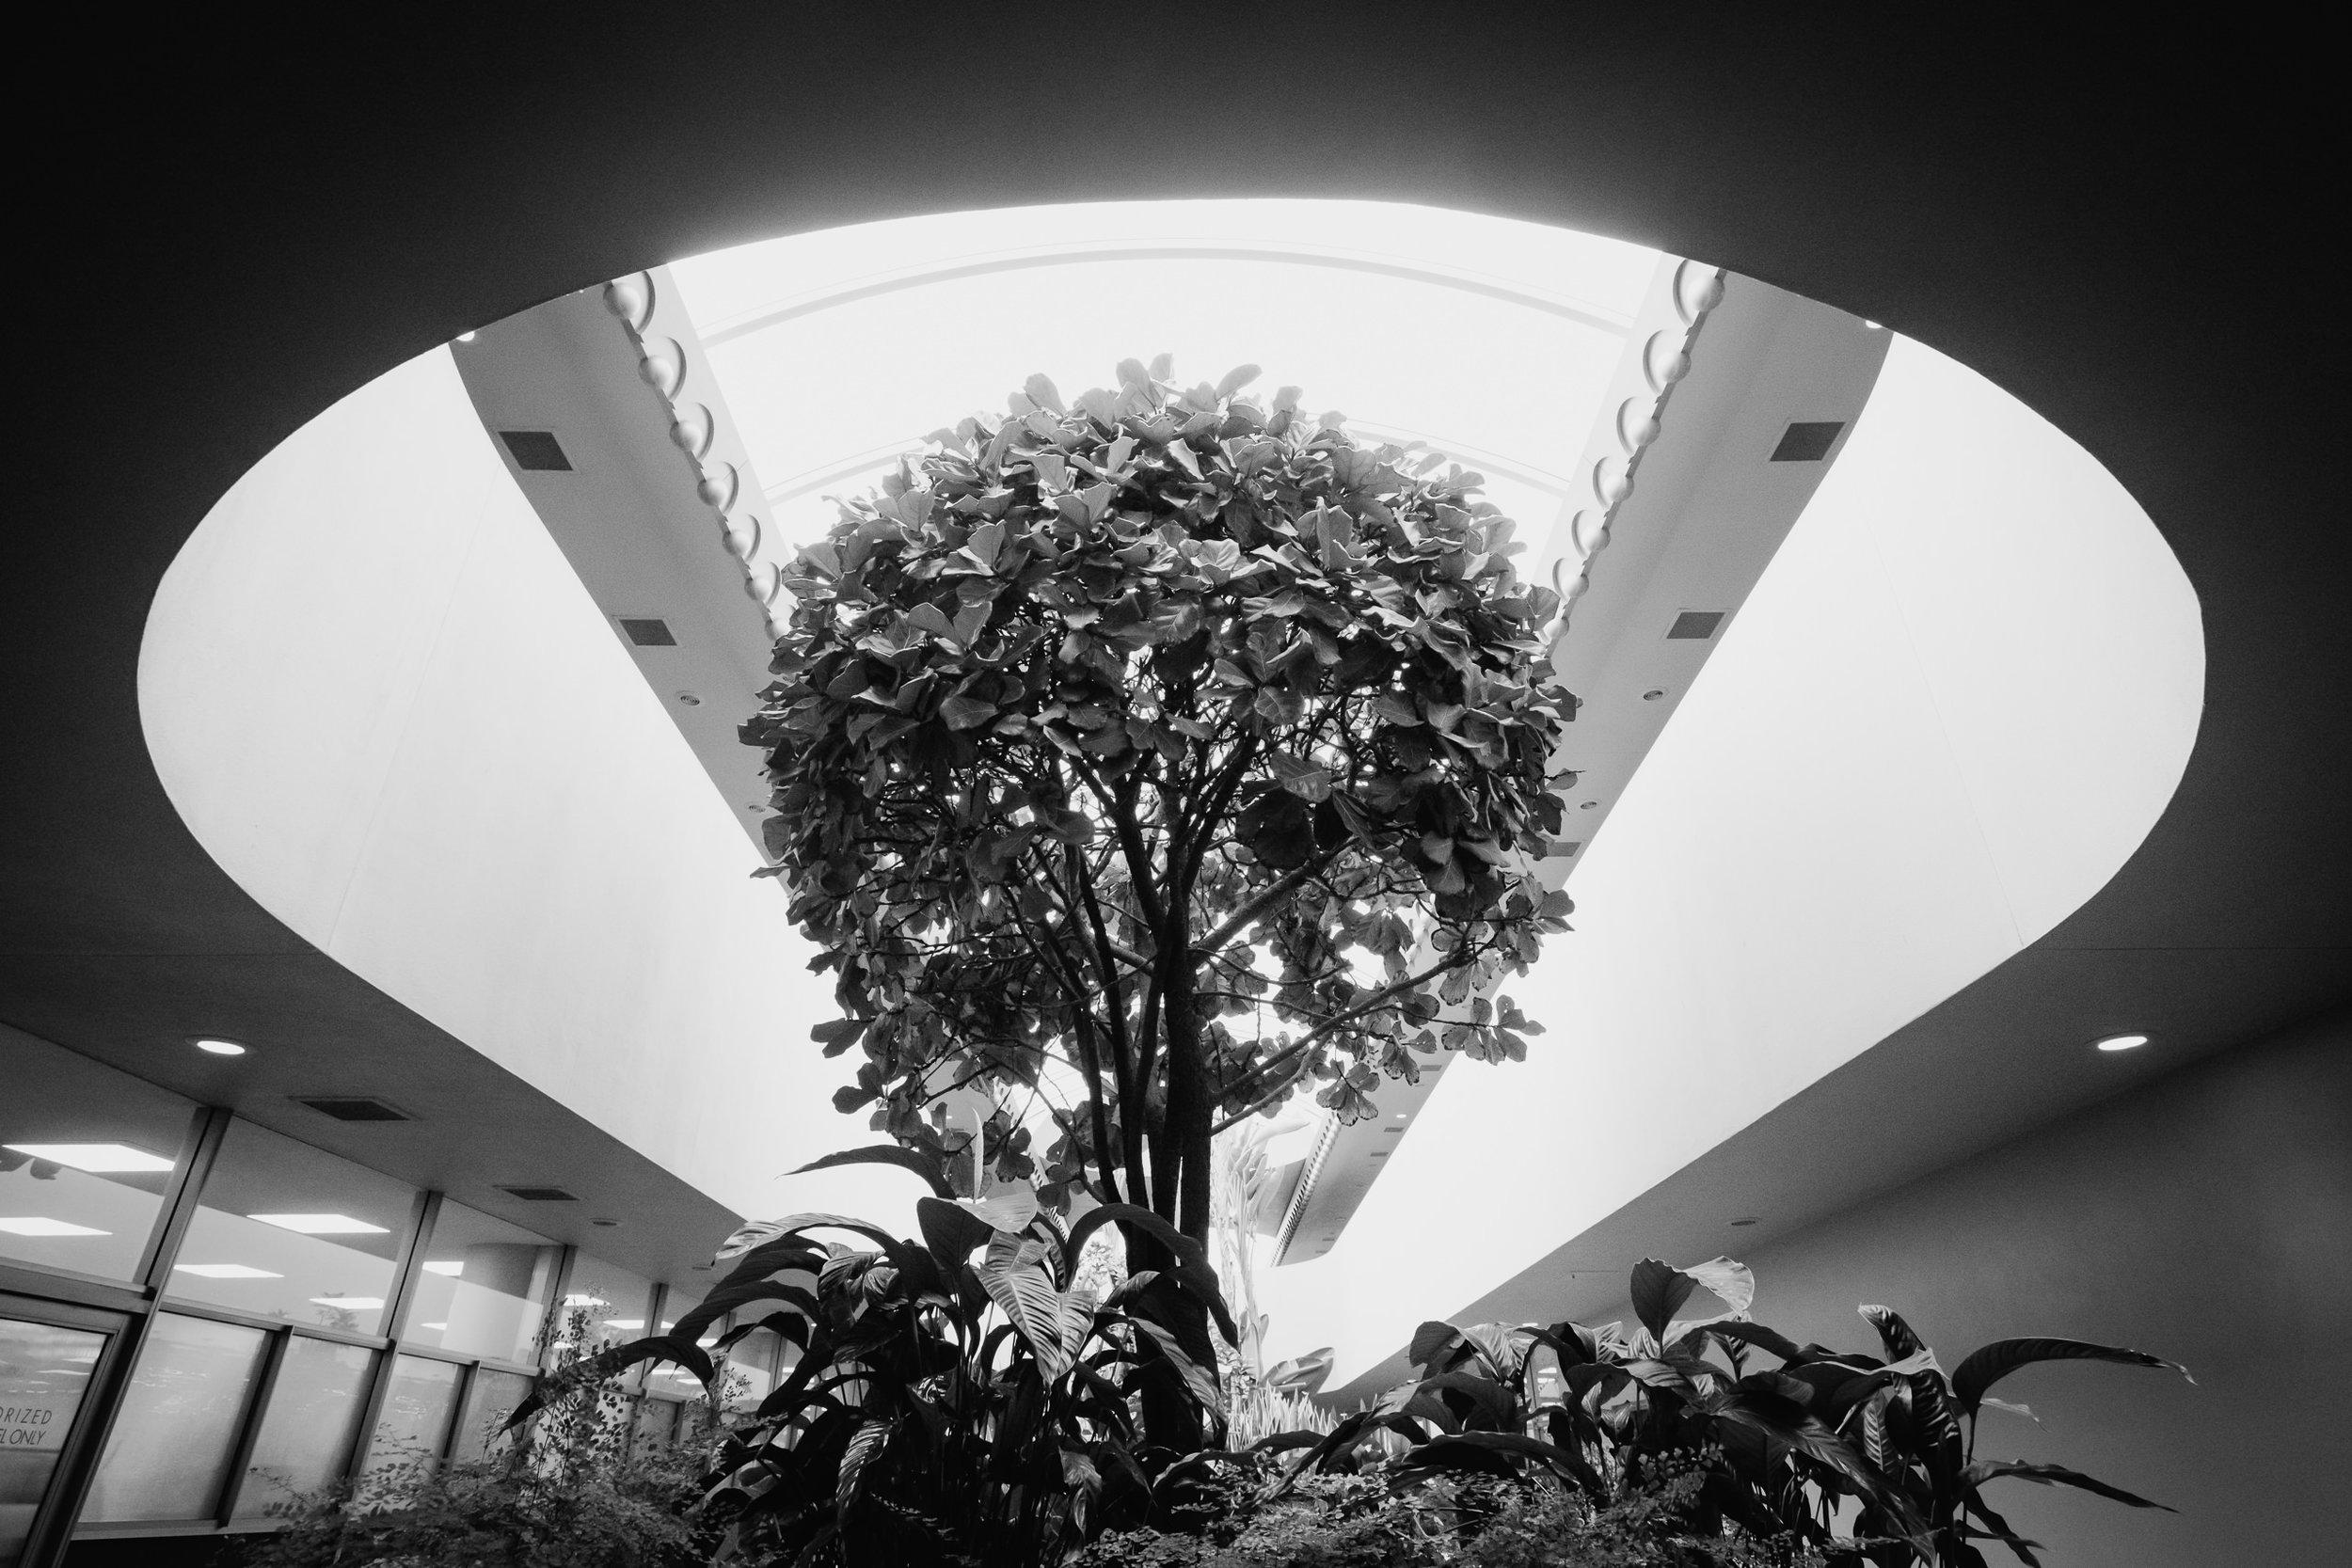 20190227 Marin Civic Centre - K M Dale Tan - 2204.jpg